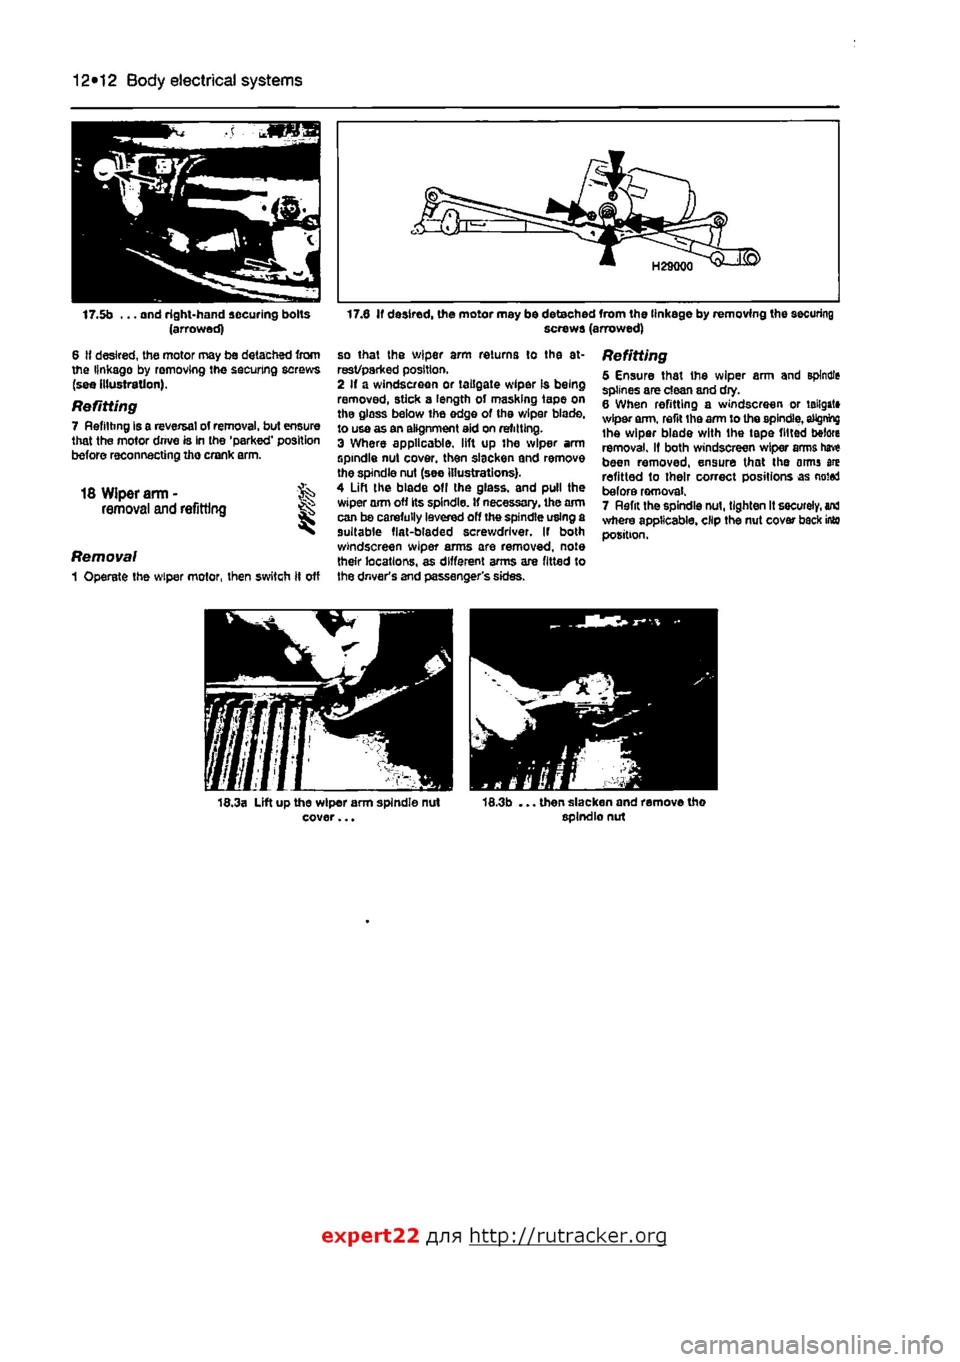 FIAT PUNTO 1997 176 / 1.G Workshop Manual